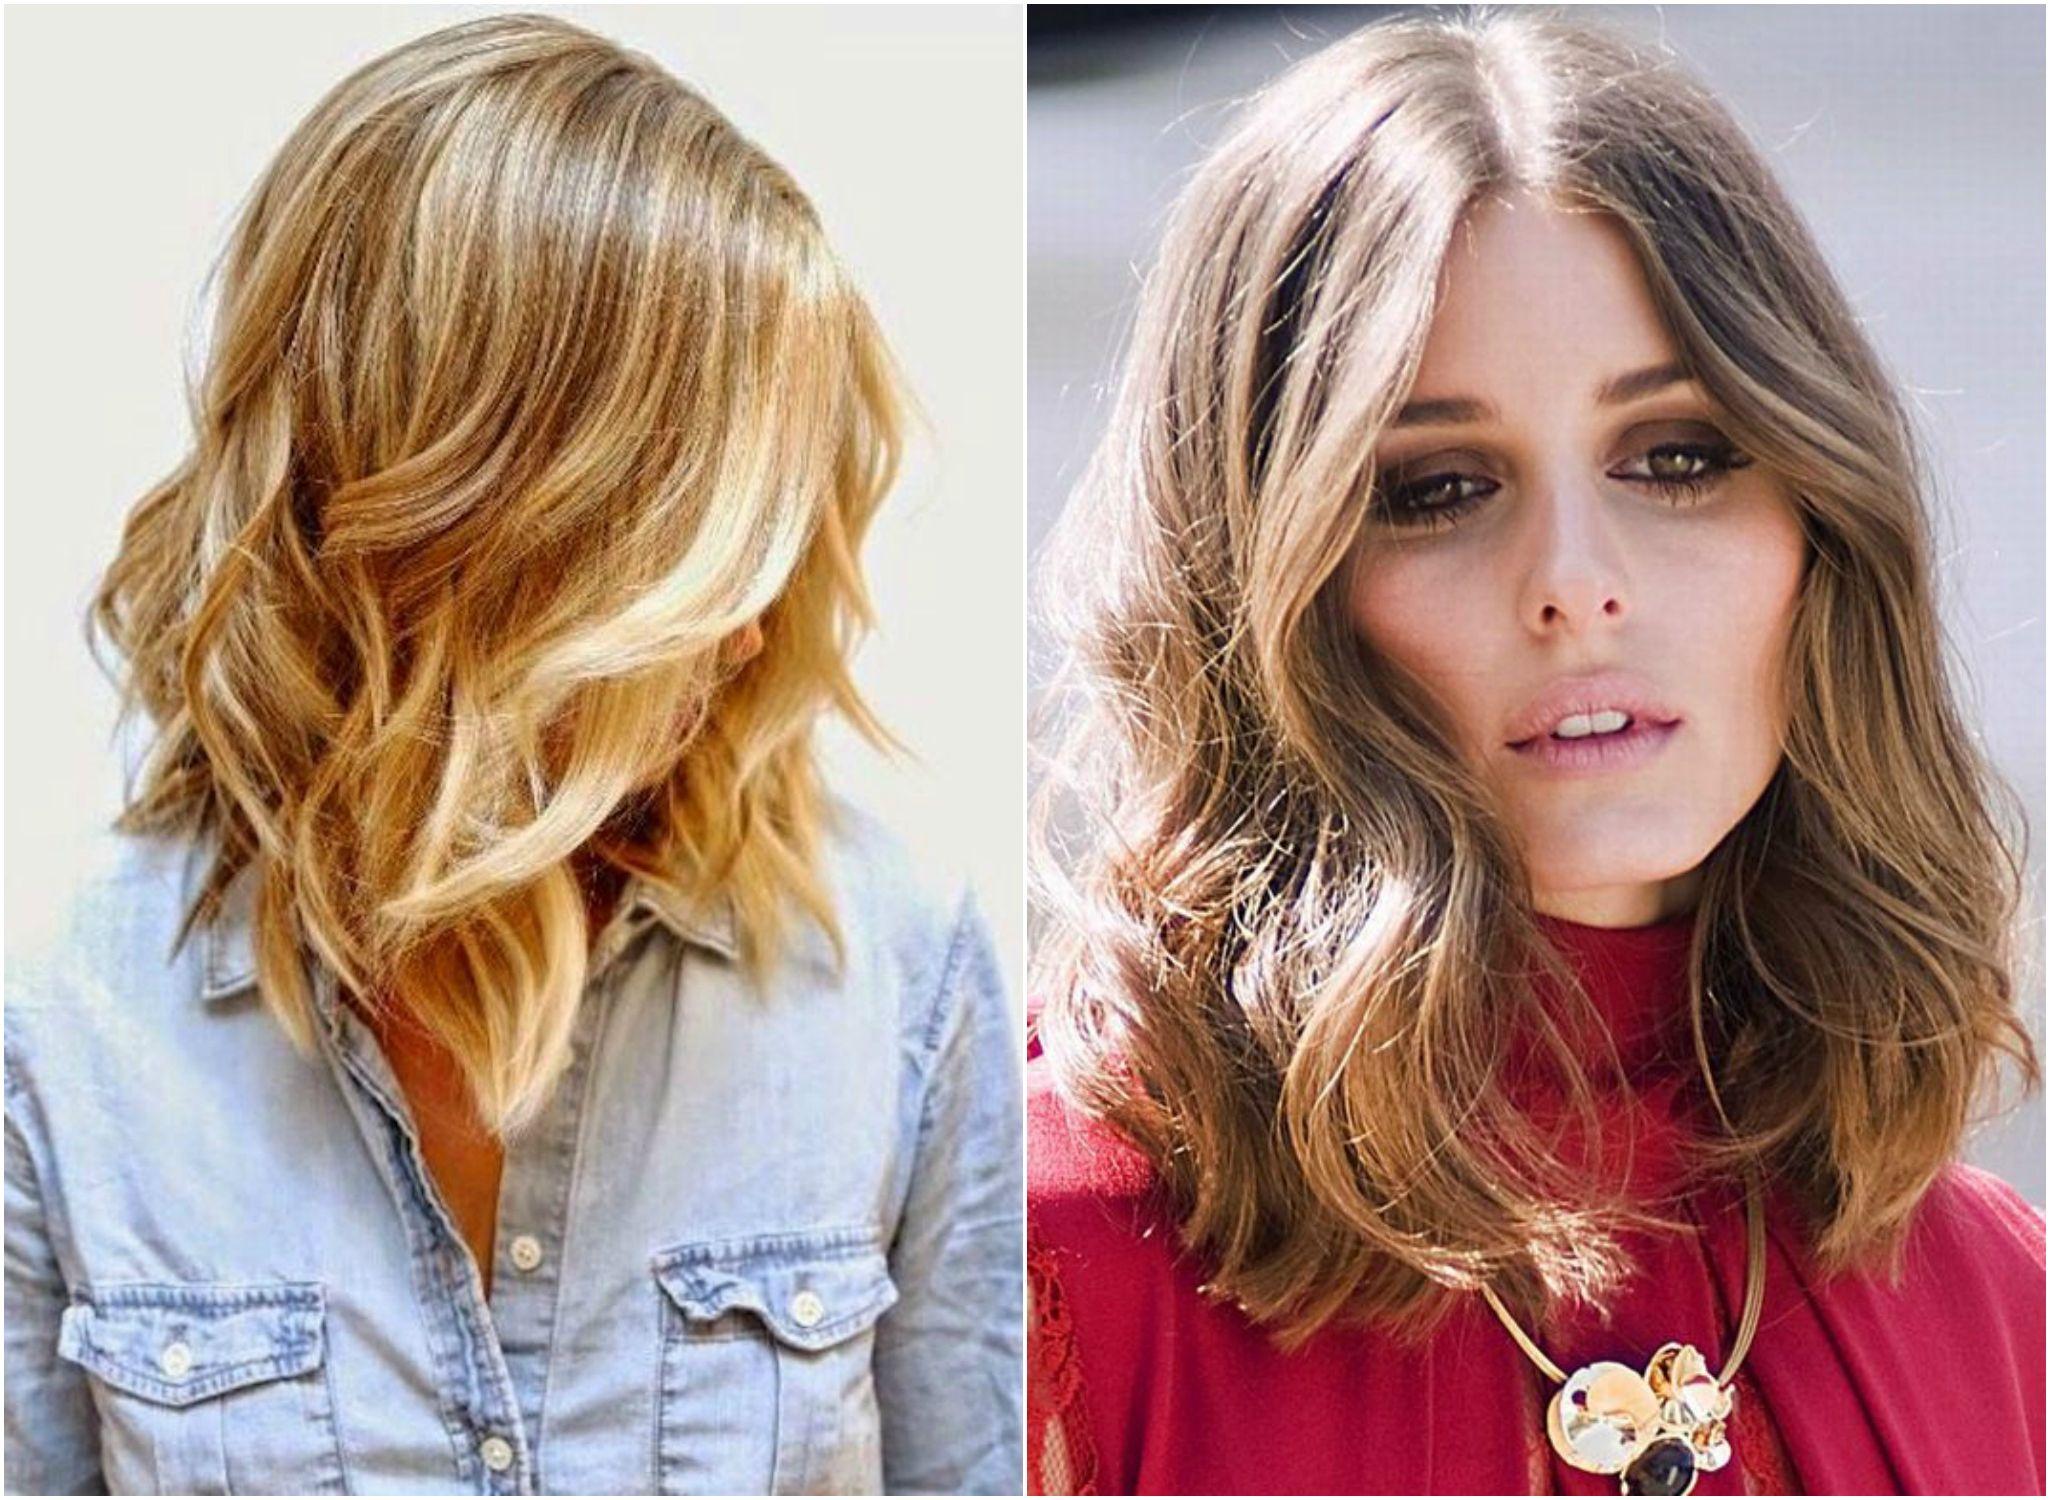 Tend ncias de cortes de cabelos femininos ver o 2015 fotos